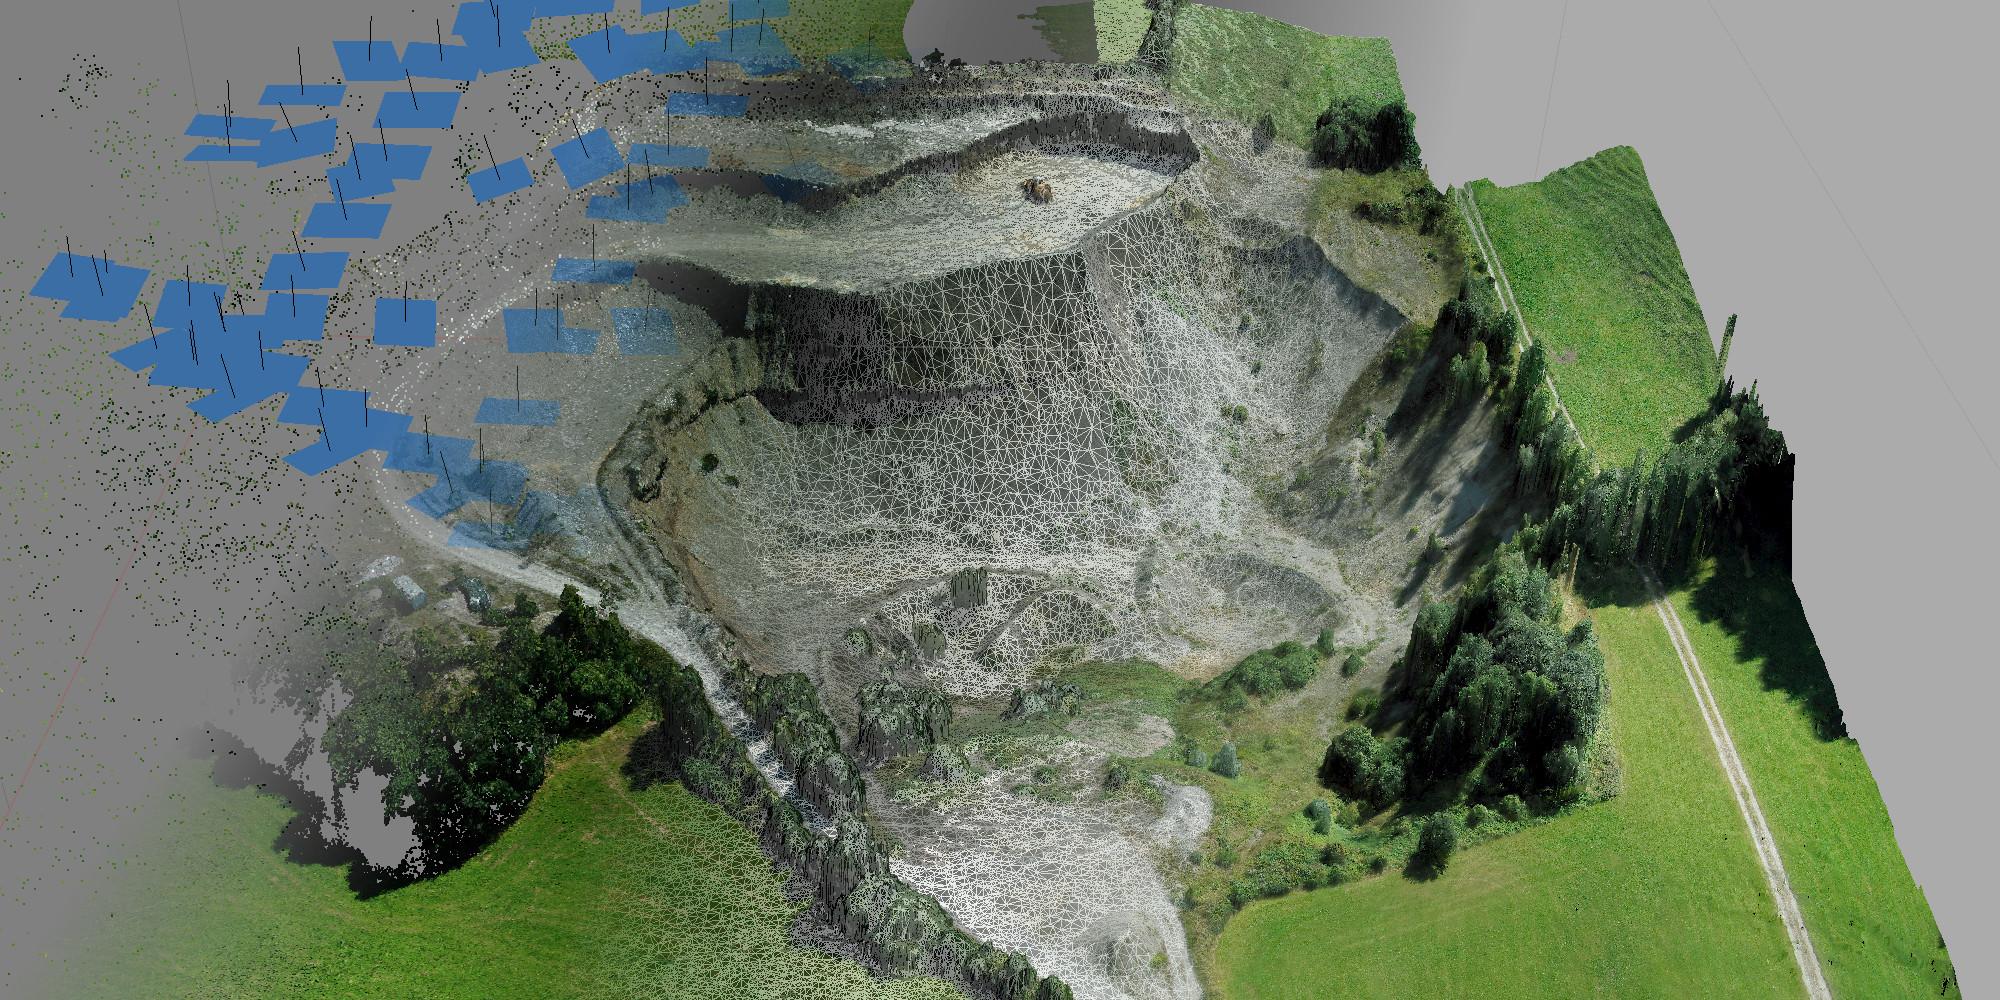 87654-friesenried-kg-geiger-2016-08-14-web-ofme-points-texture